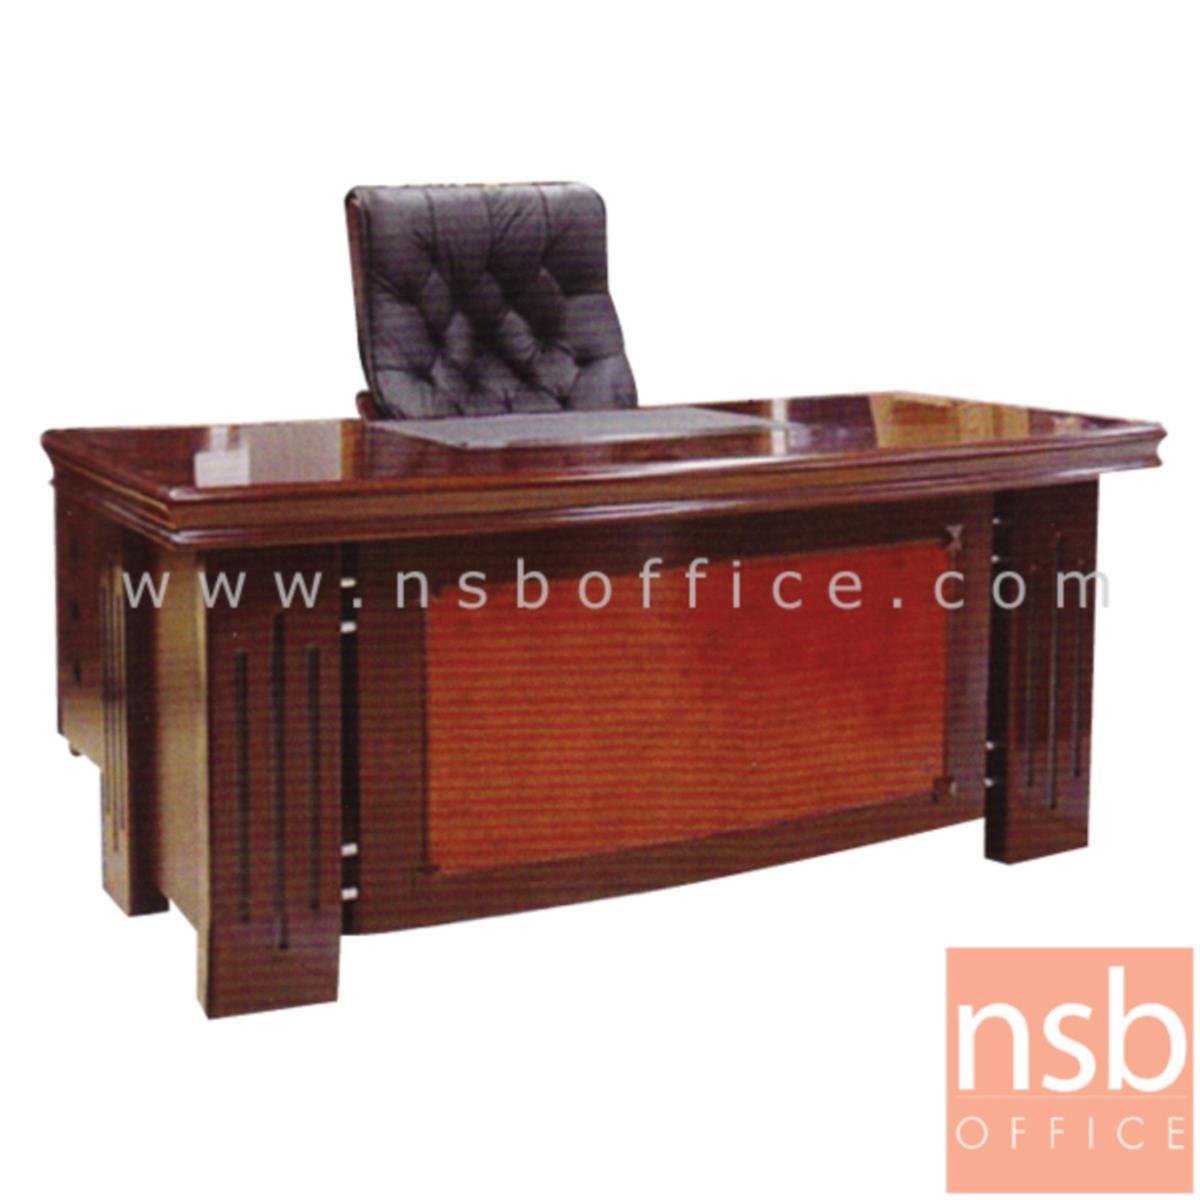 A06A049:โต๊ะผู้บริหารตัวแอล รุ่น Reflection (รีเฟคชั่น) ขนาด 160W cm. พร้อมตู้ลิ้นชักและตู้ข้าง